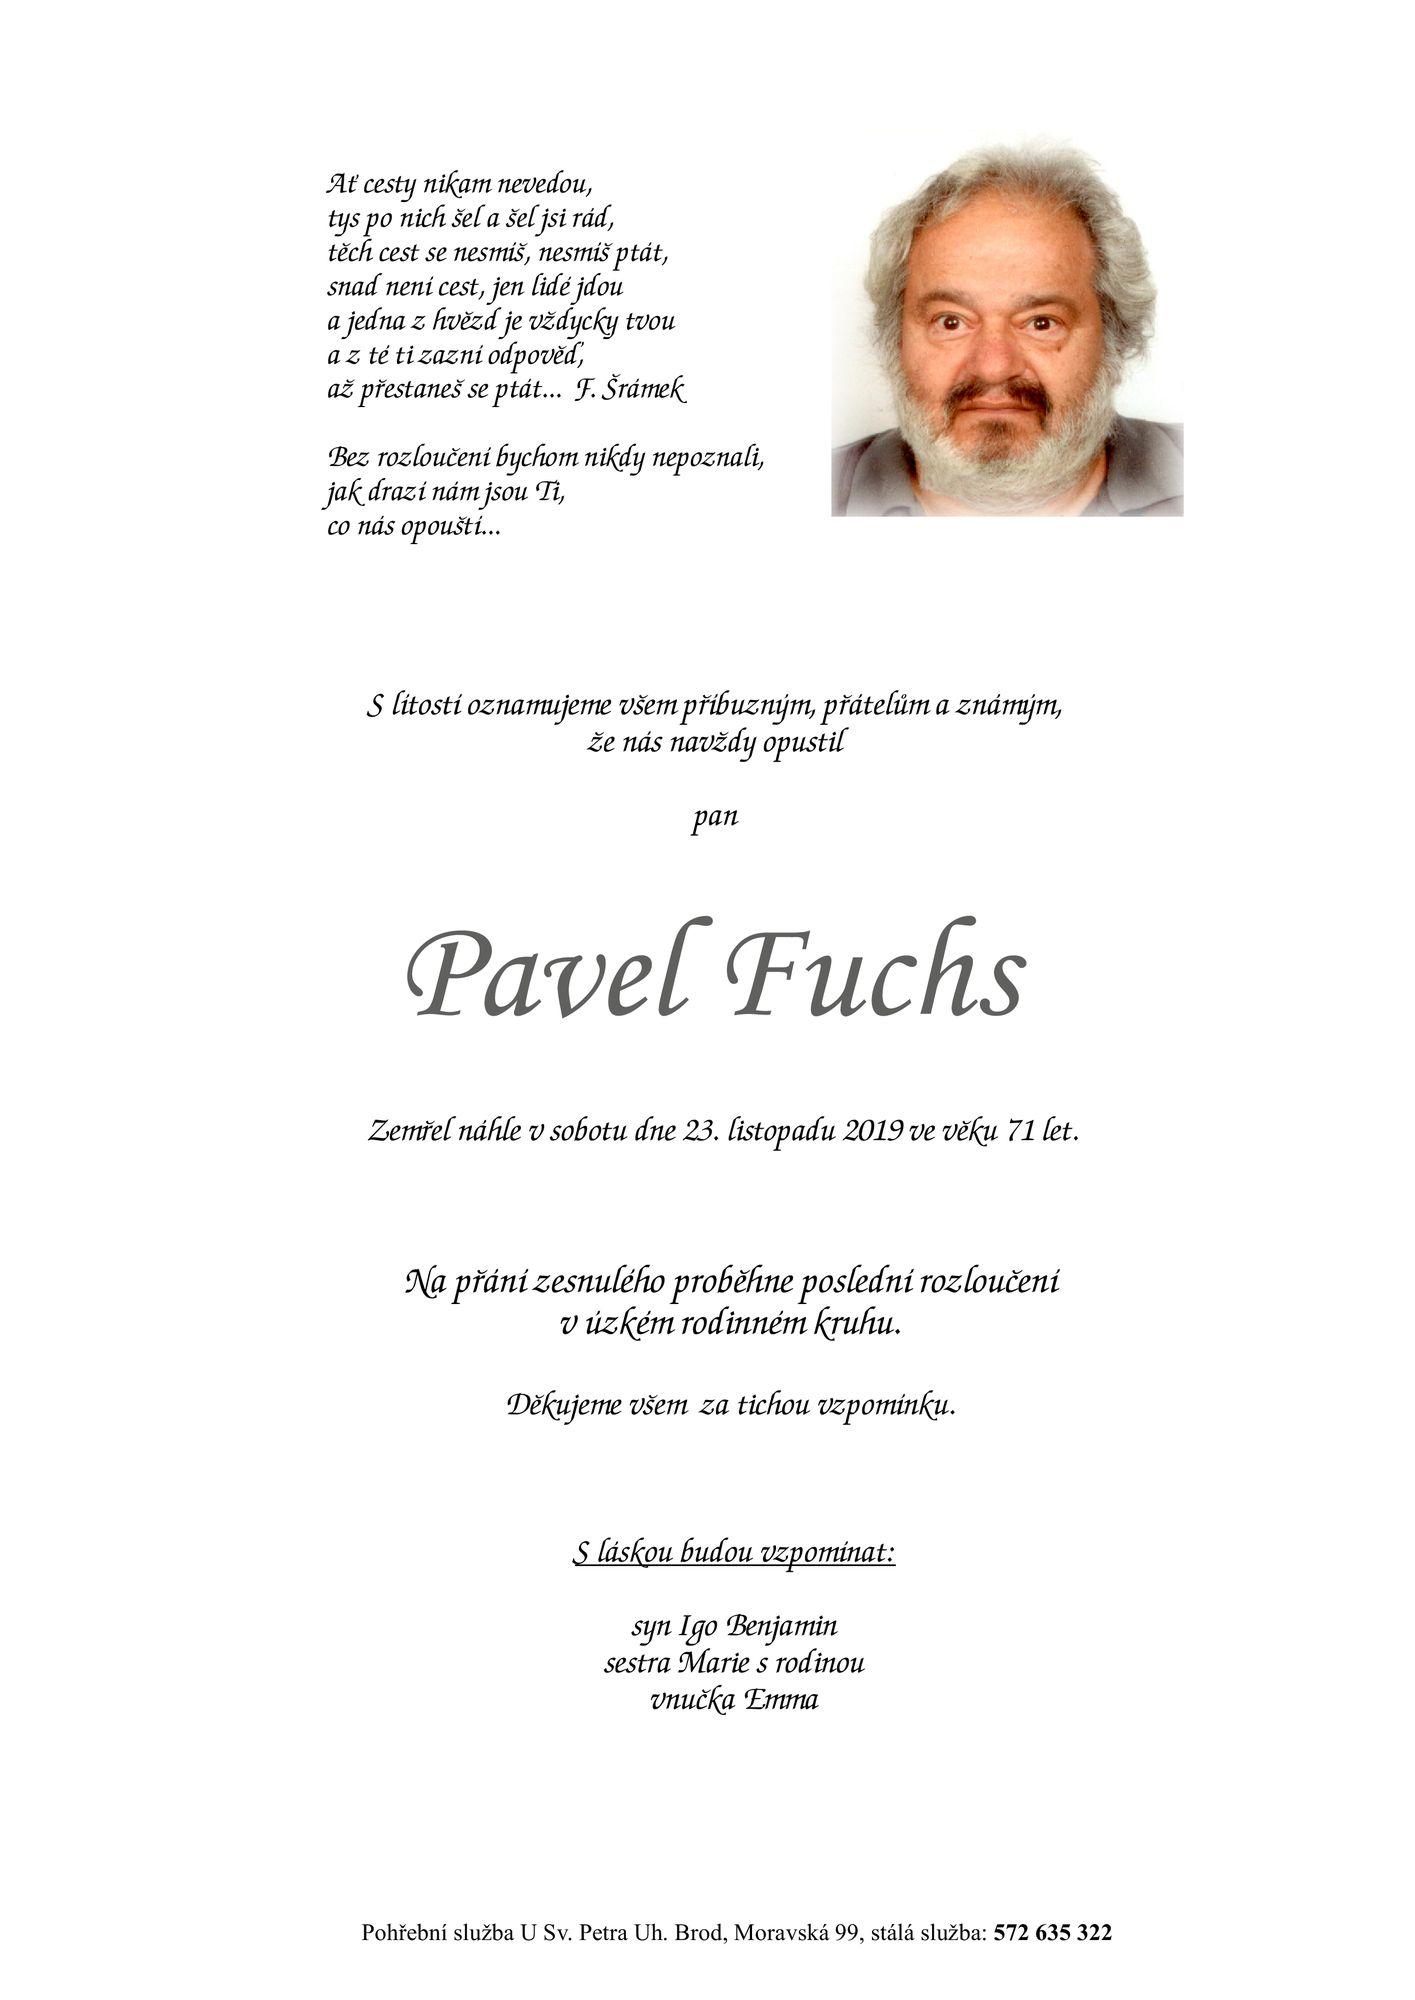 Pavel Fuchs